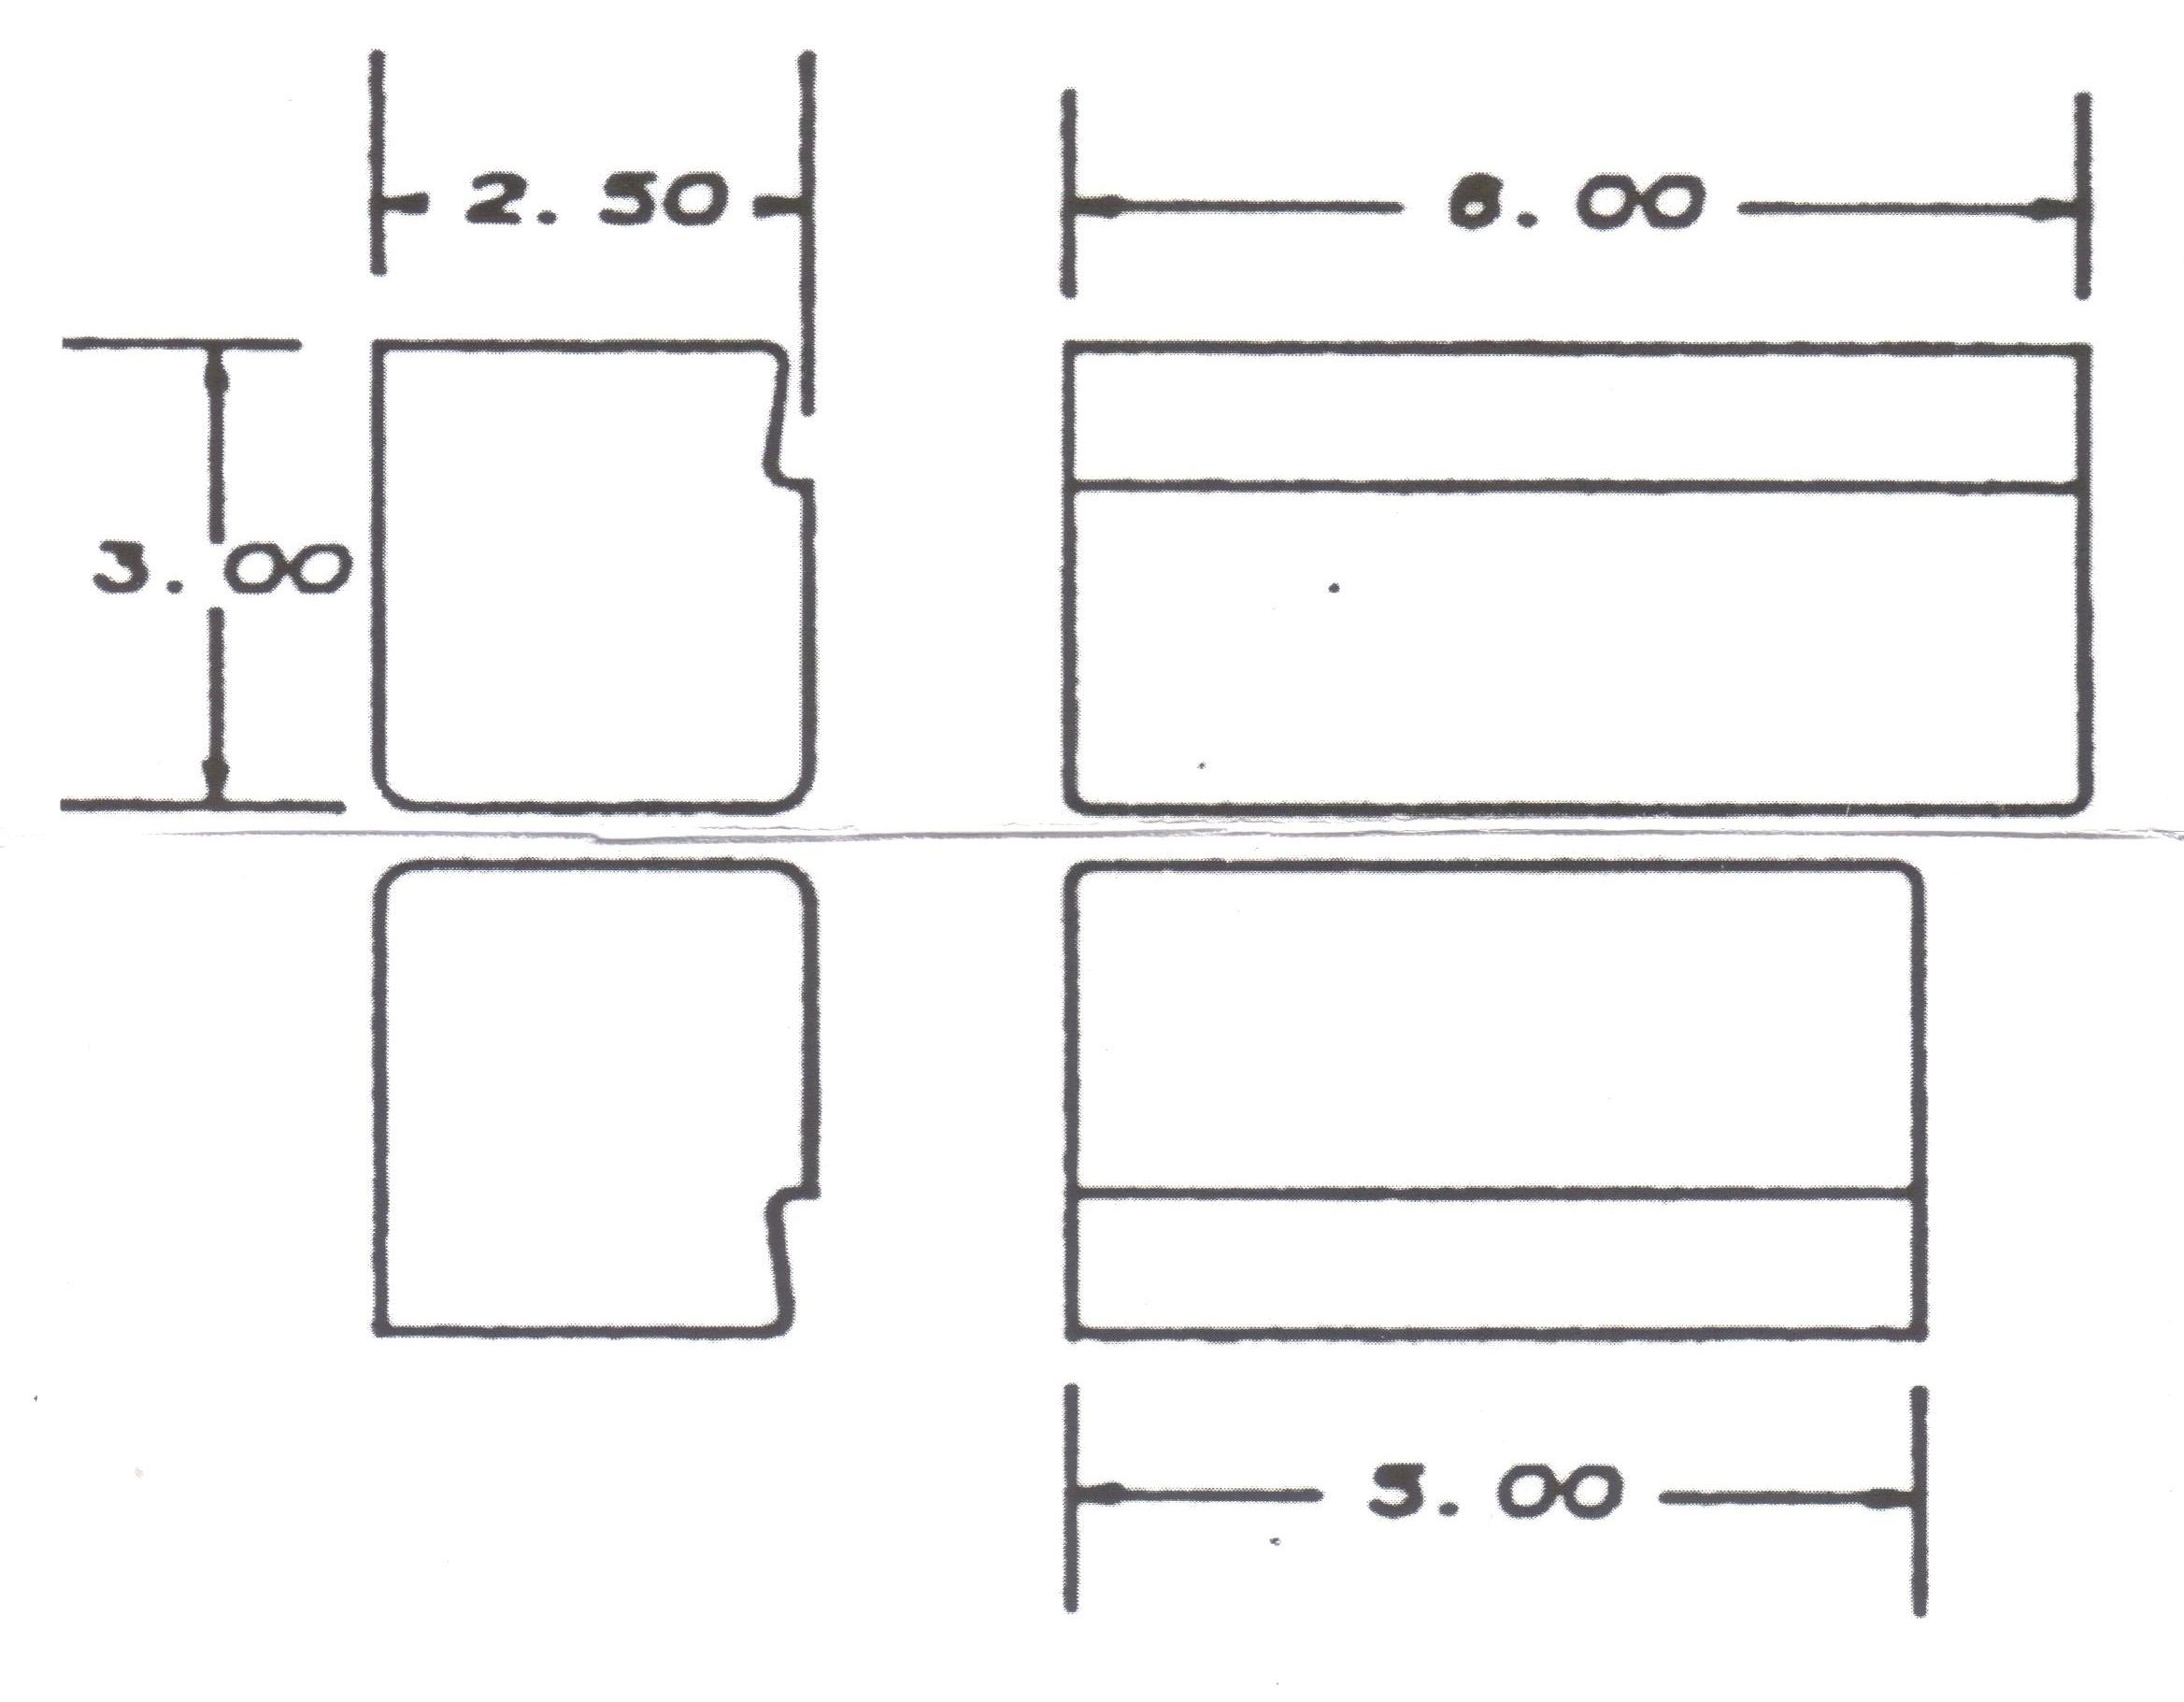 Standard Flat Dies -Top & Bottom Interchangeable $250.00 -